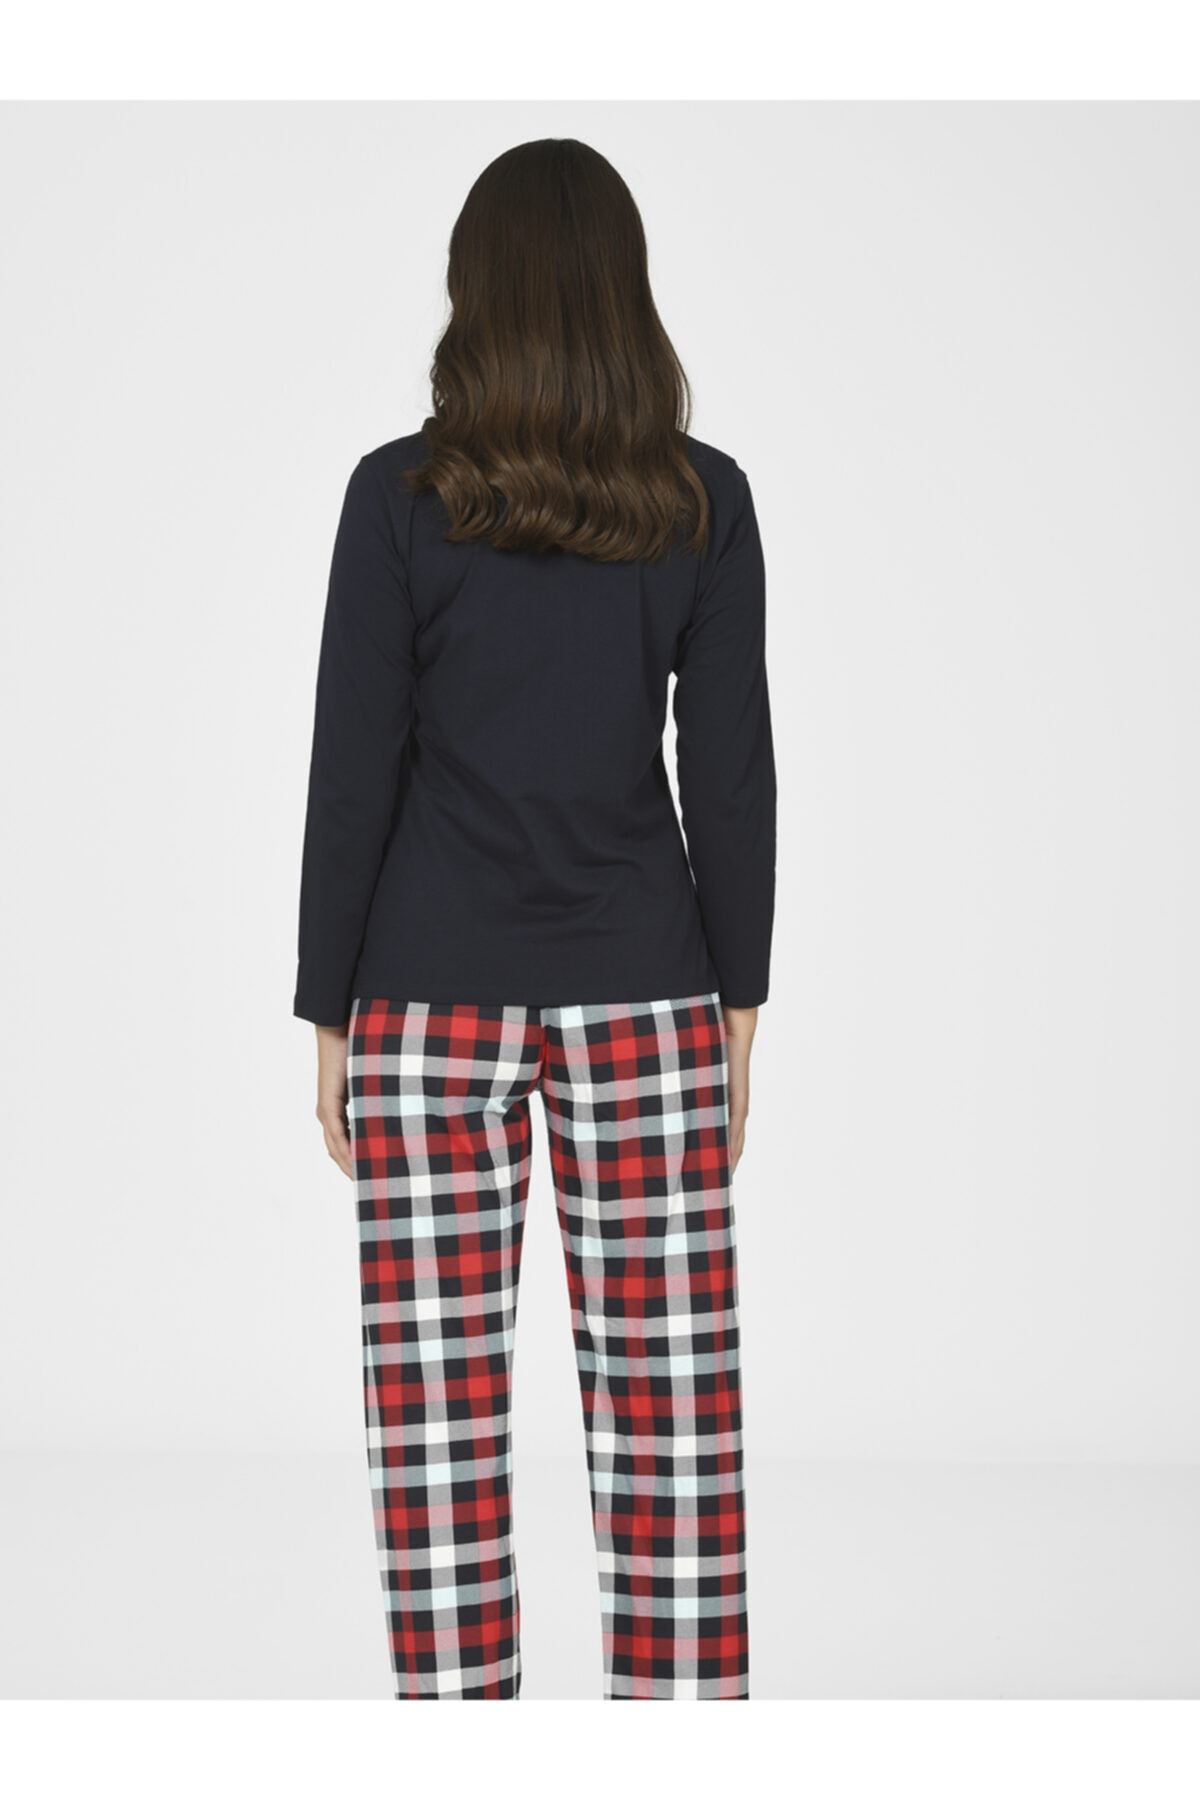 NBB Kadın Kırmızı Dear Bad Pijama Takımı 66802 2